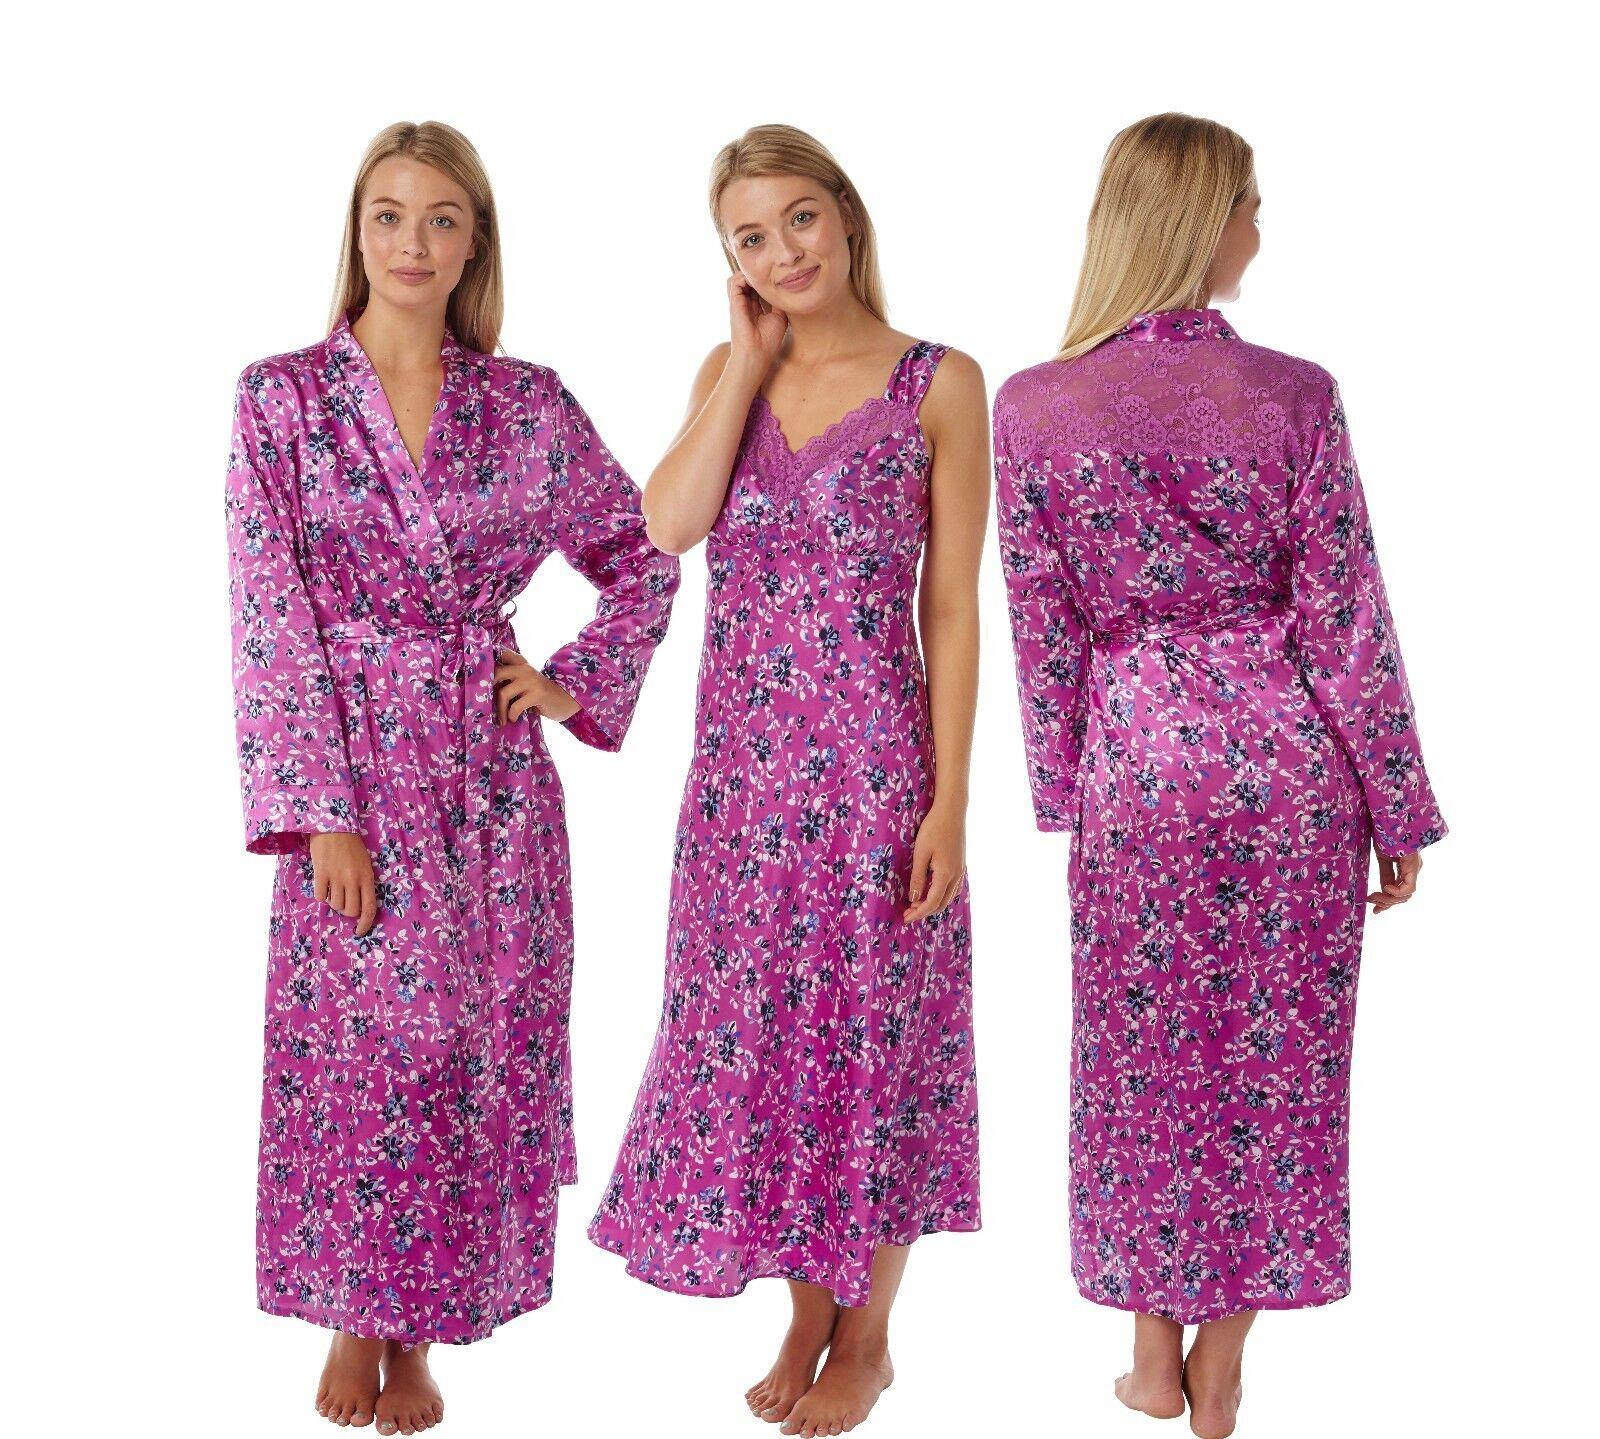 Ladies Pink Floral Long Satin Lace Nightdress Chemise Nightshirt Wrap Kimono